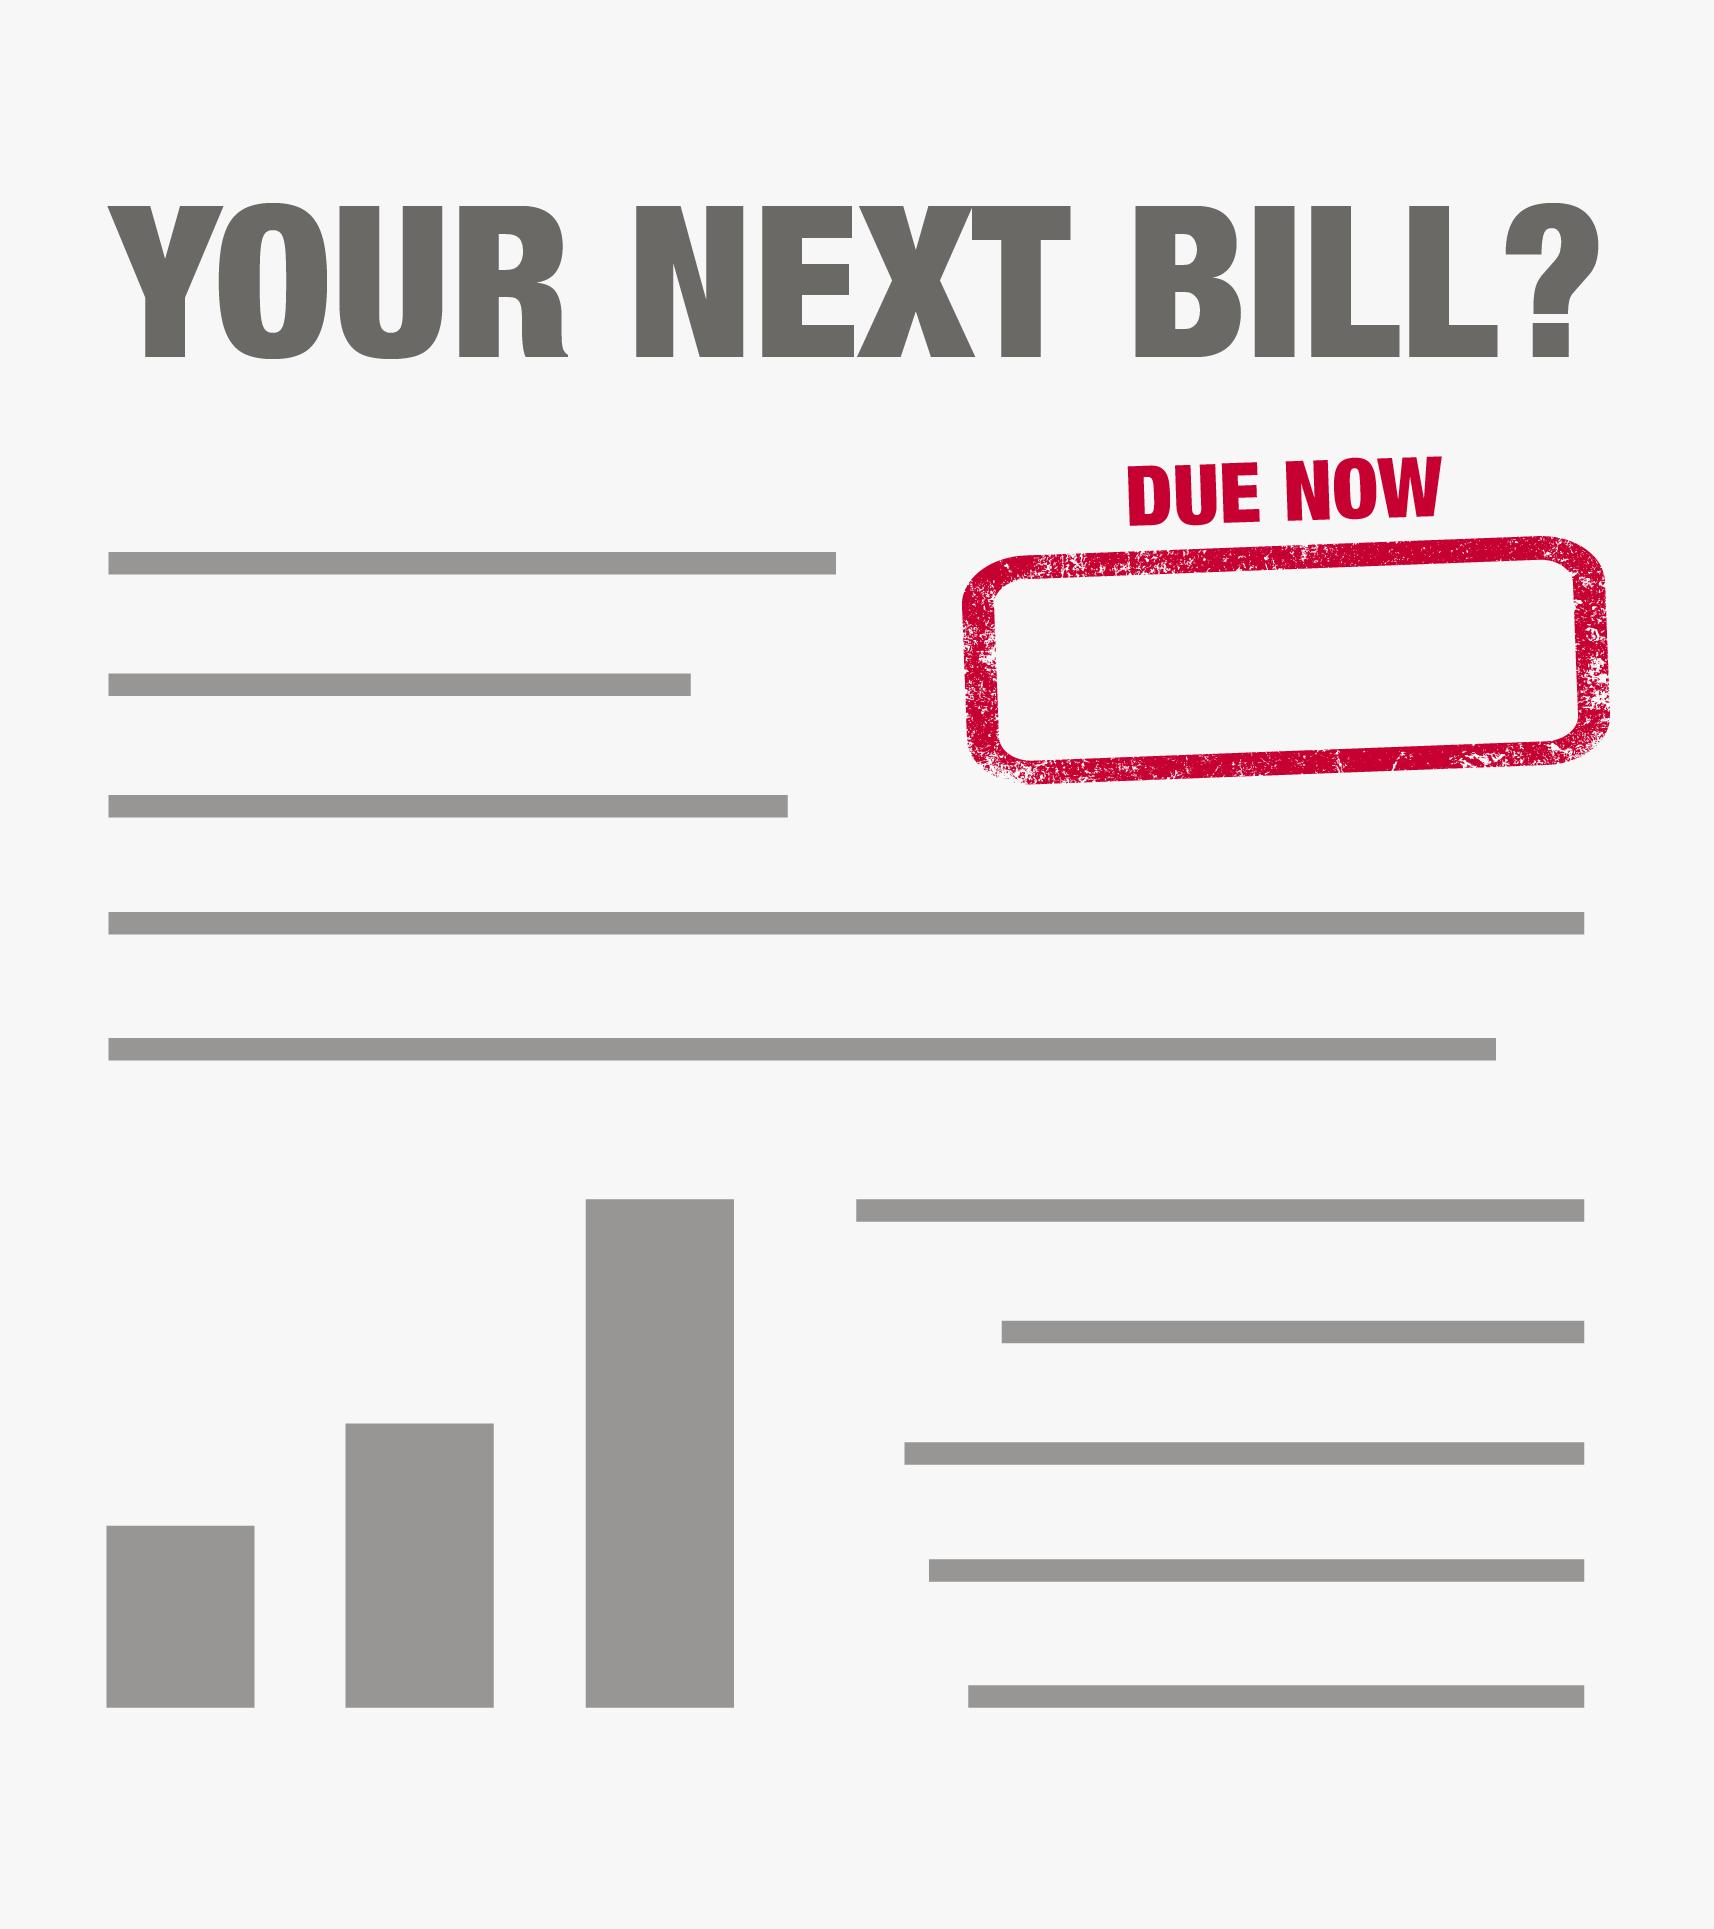 Your next power bill?